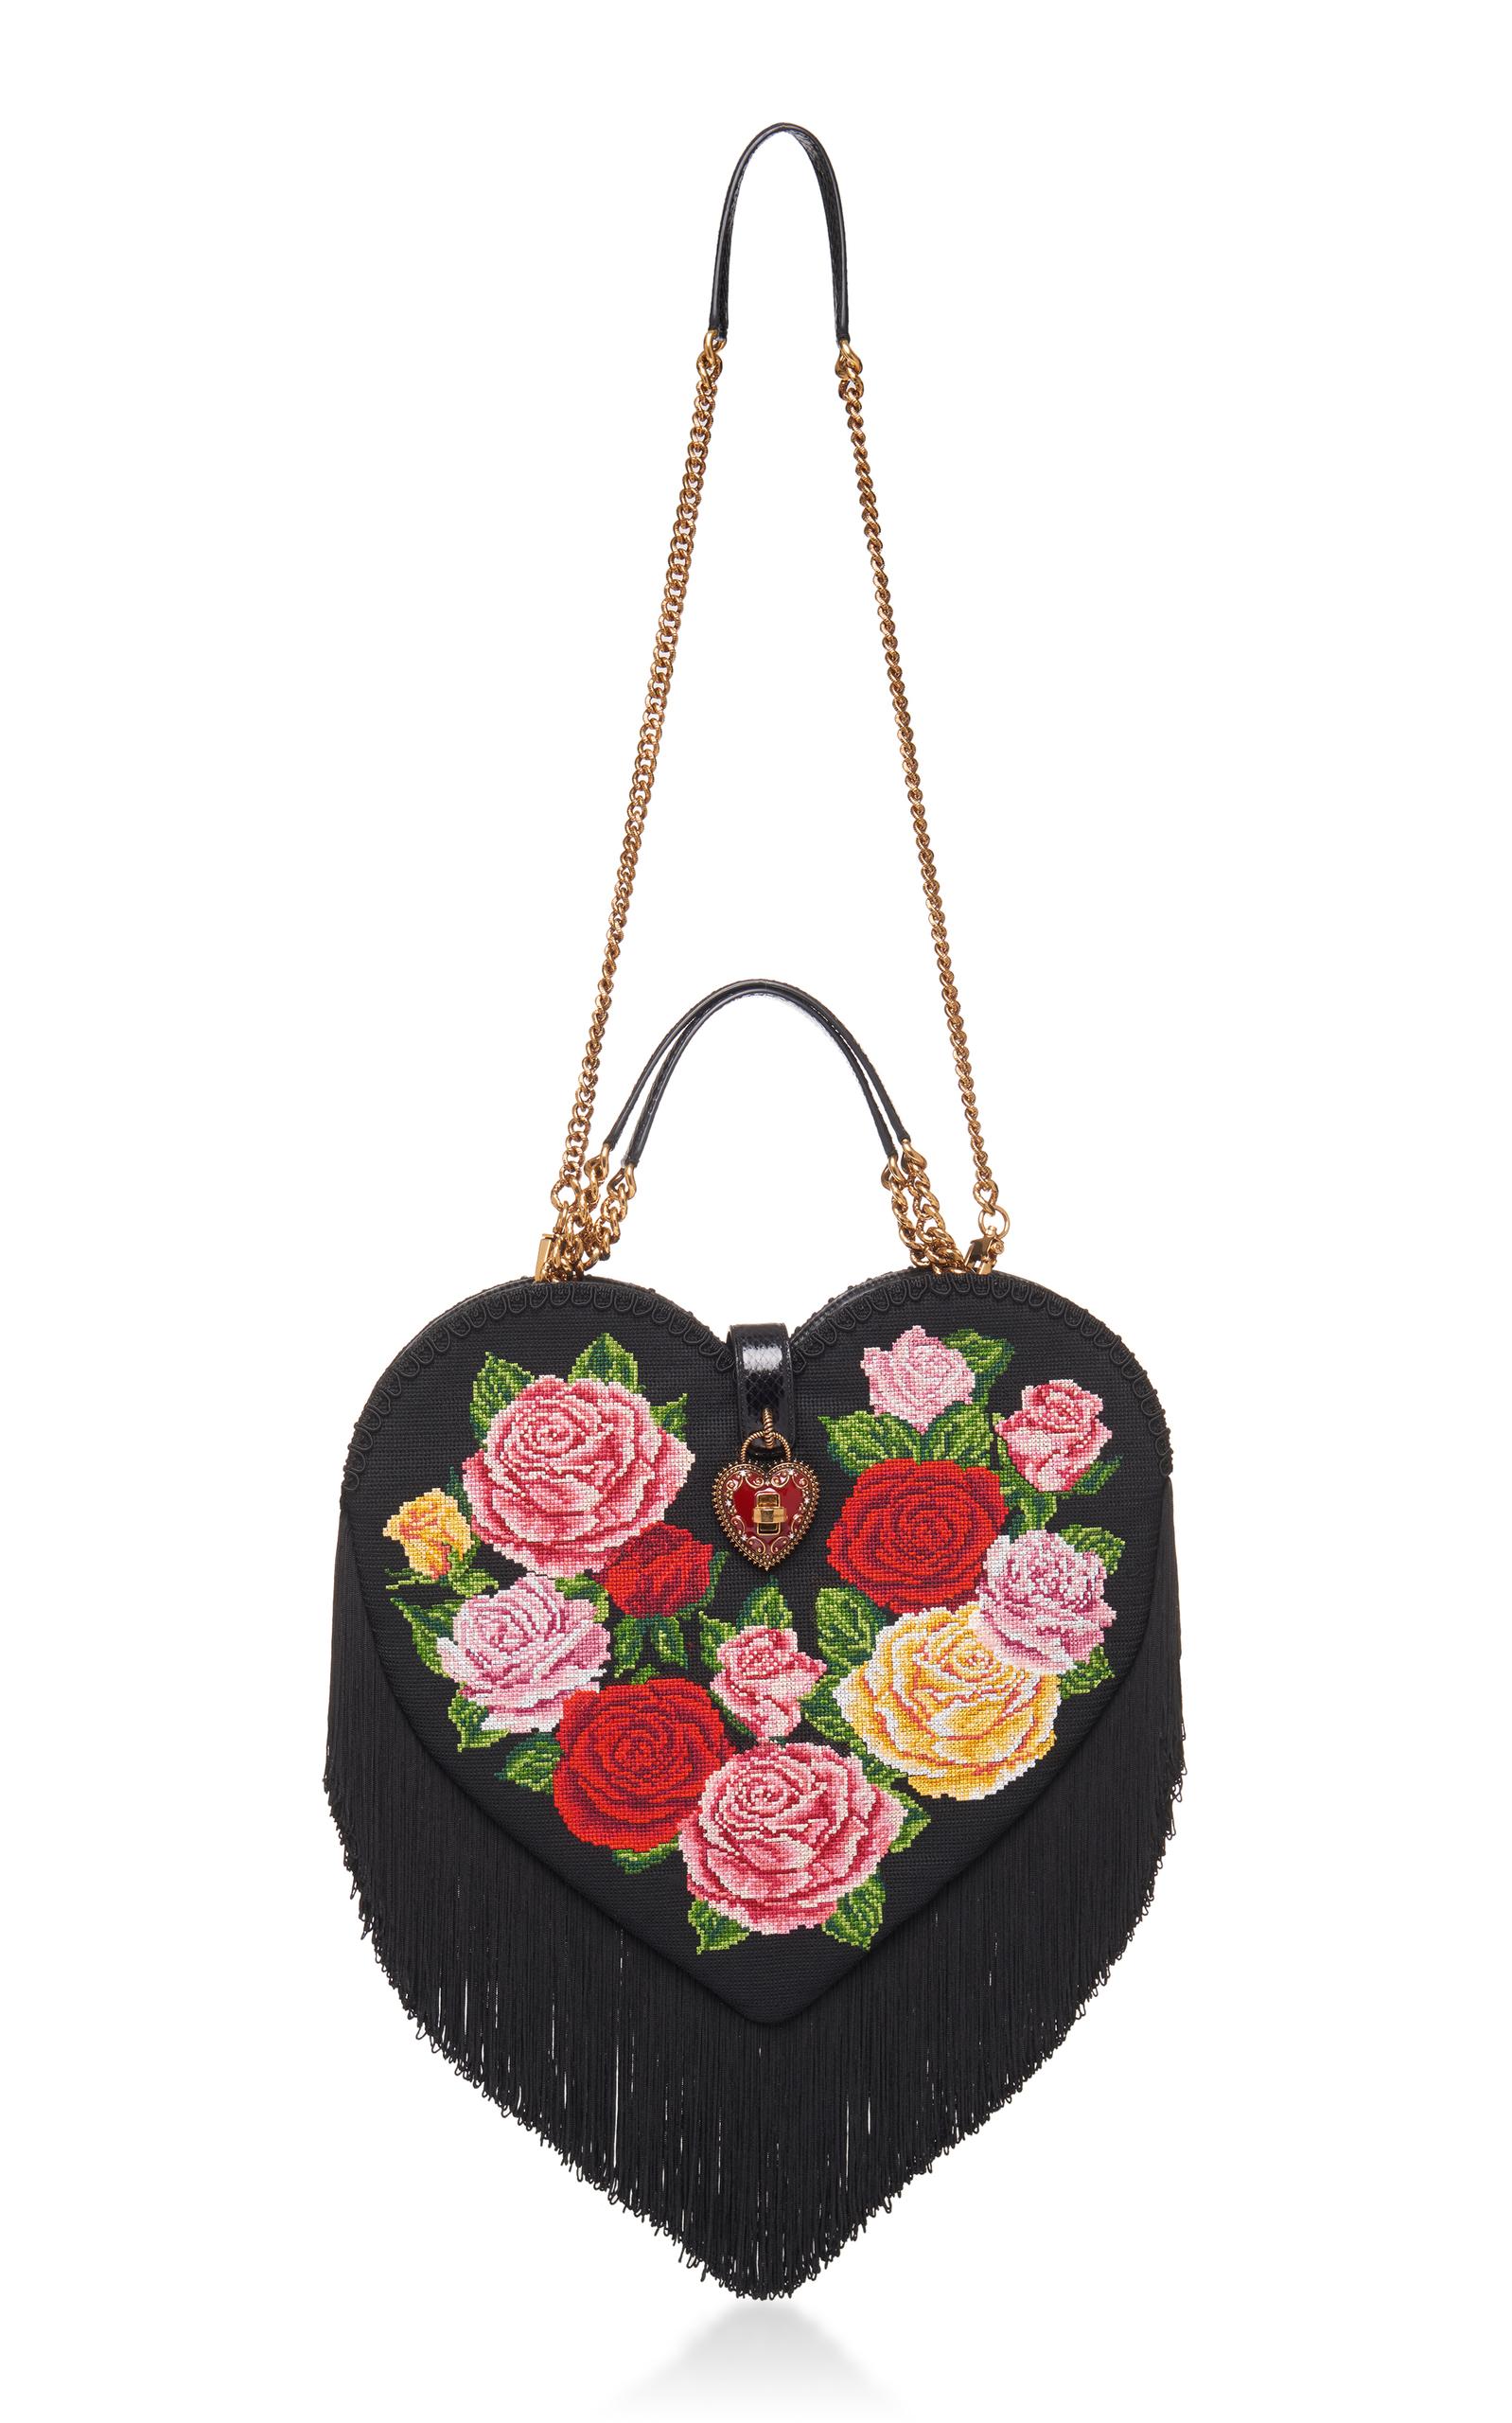 Crochet My Heart Bag by Dolce   Gabbana   Moda Operandi 7f6798d210